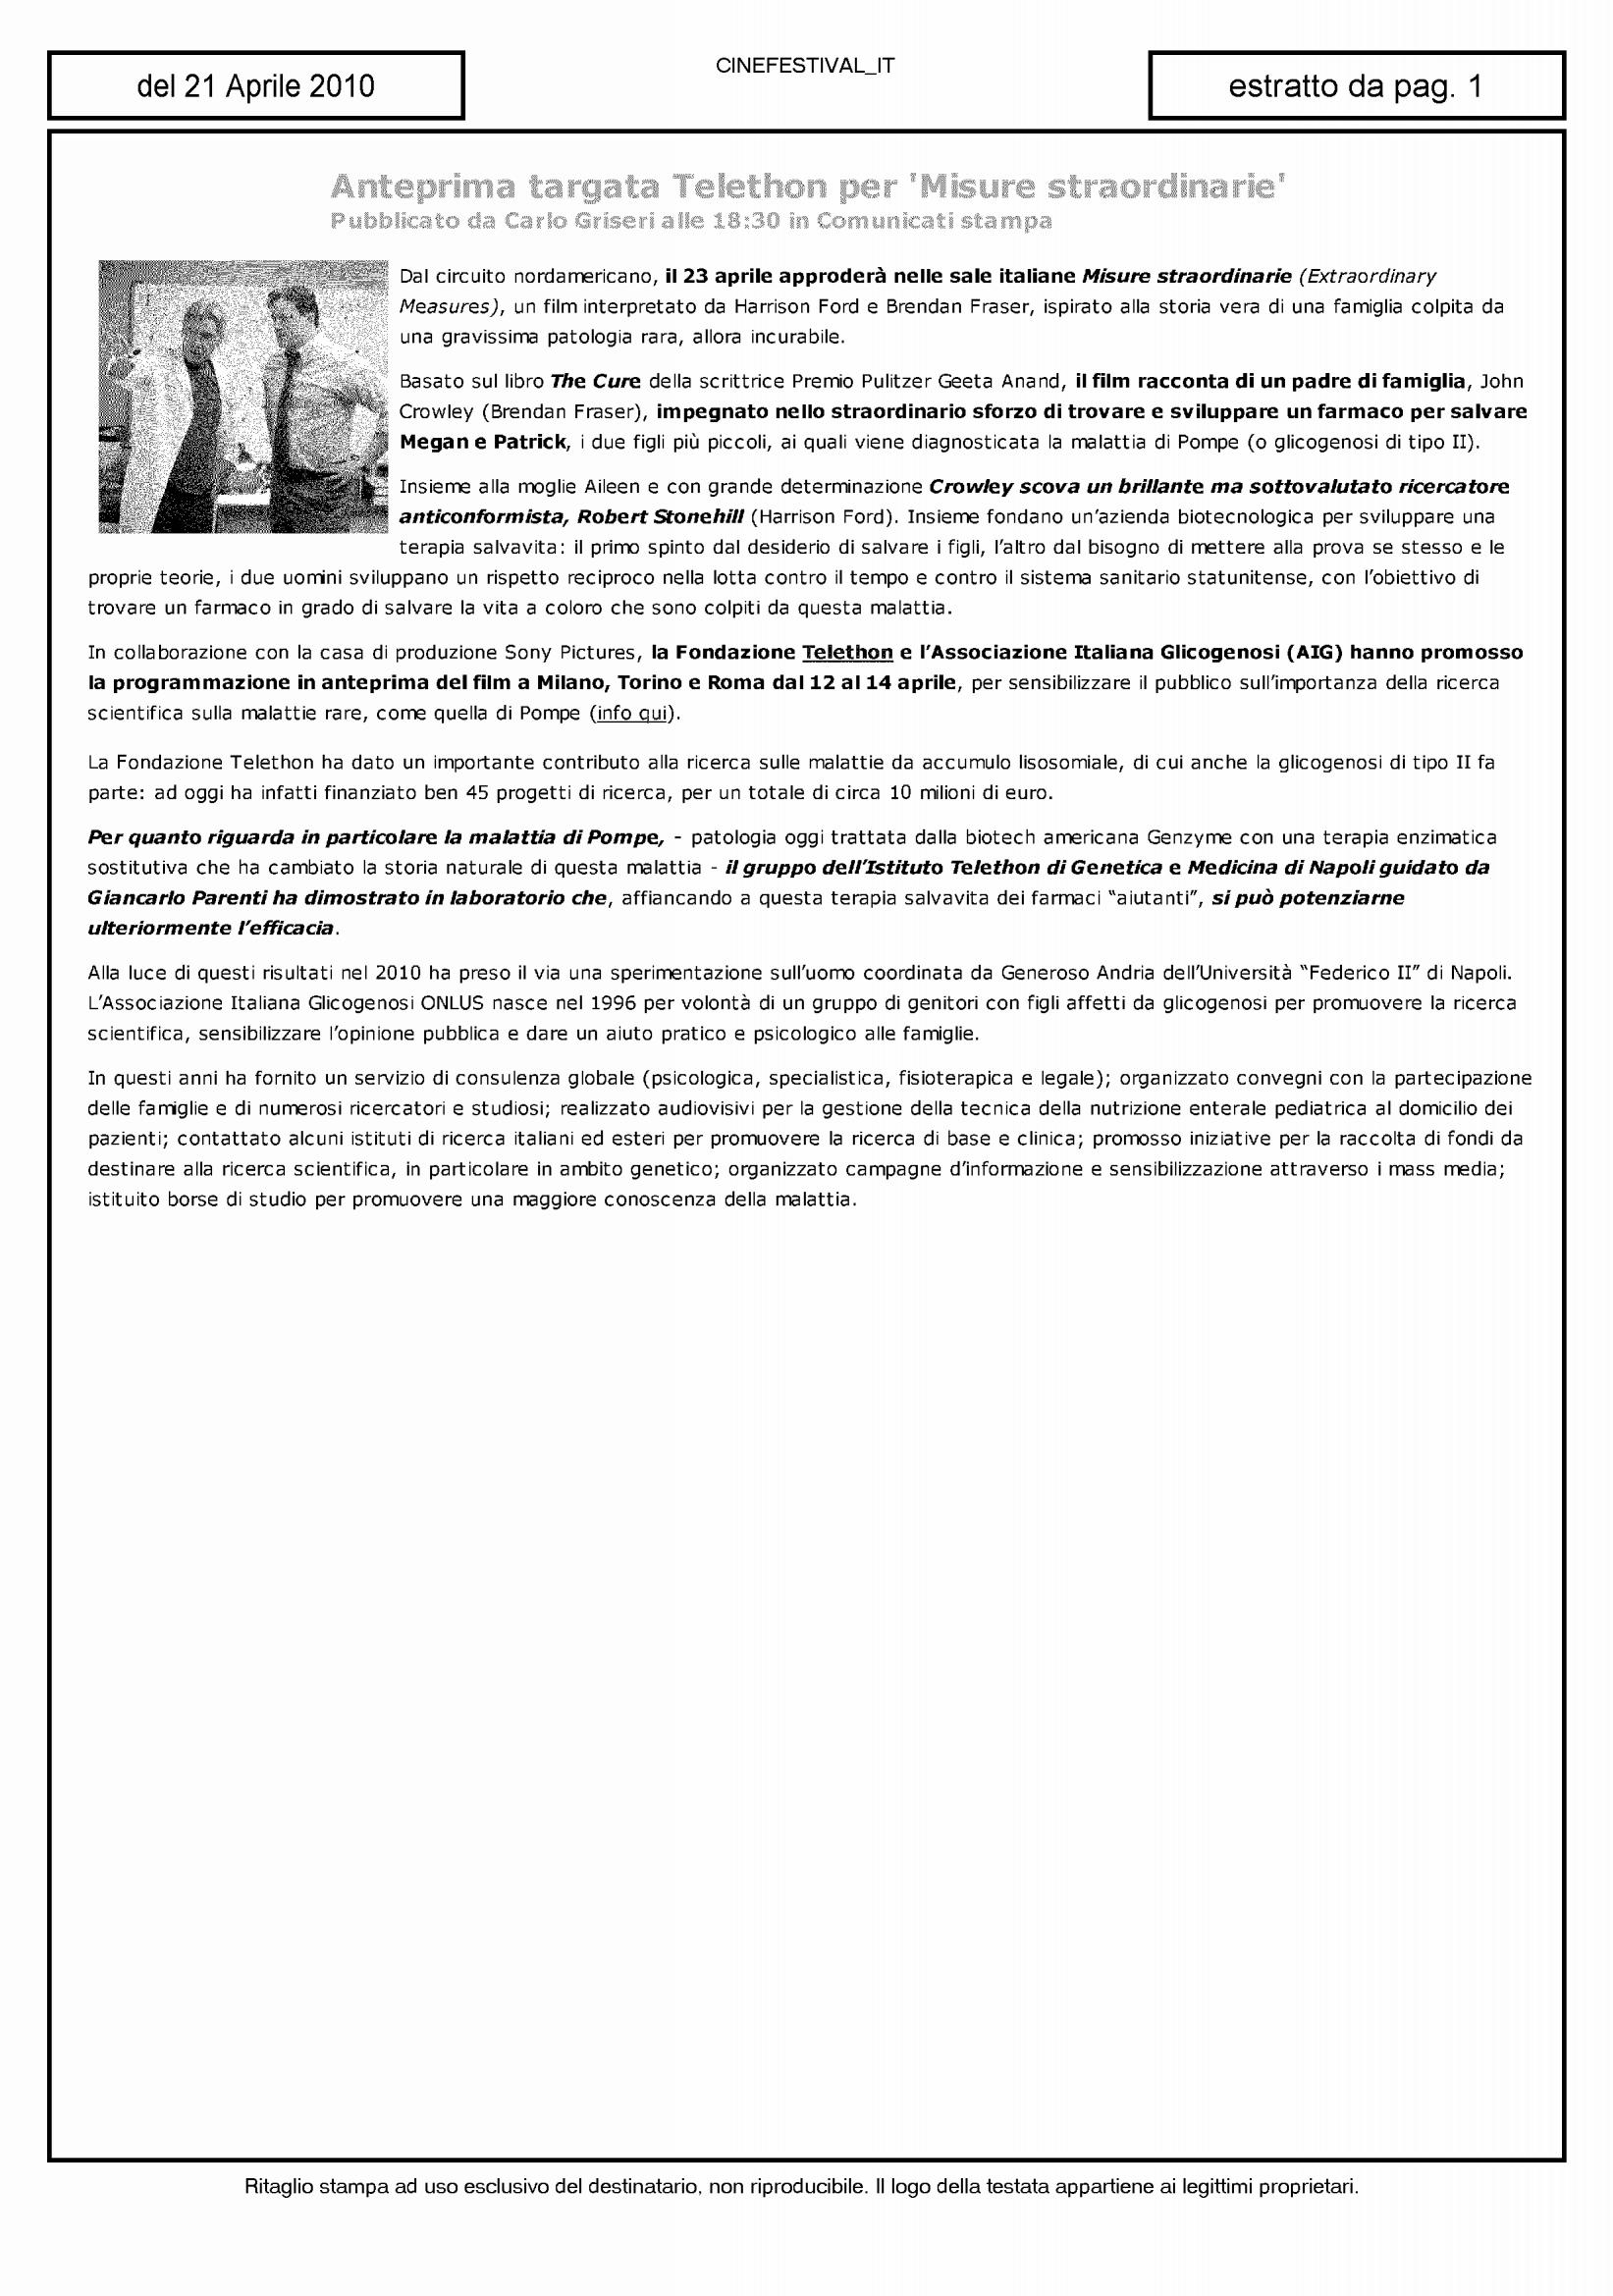 Stampa_20100422_misure straordinarie_Page_81